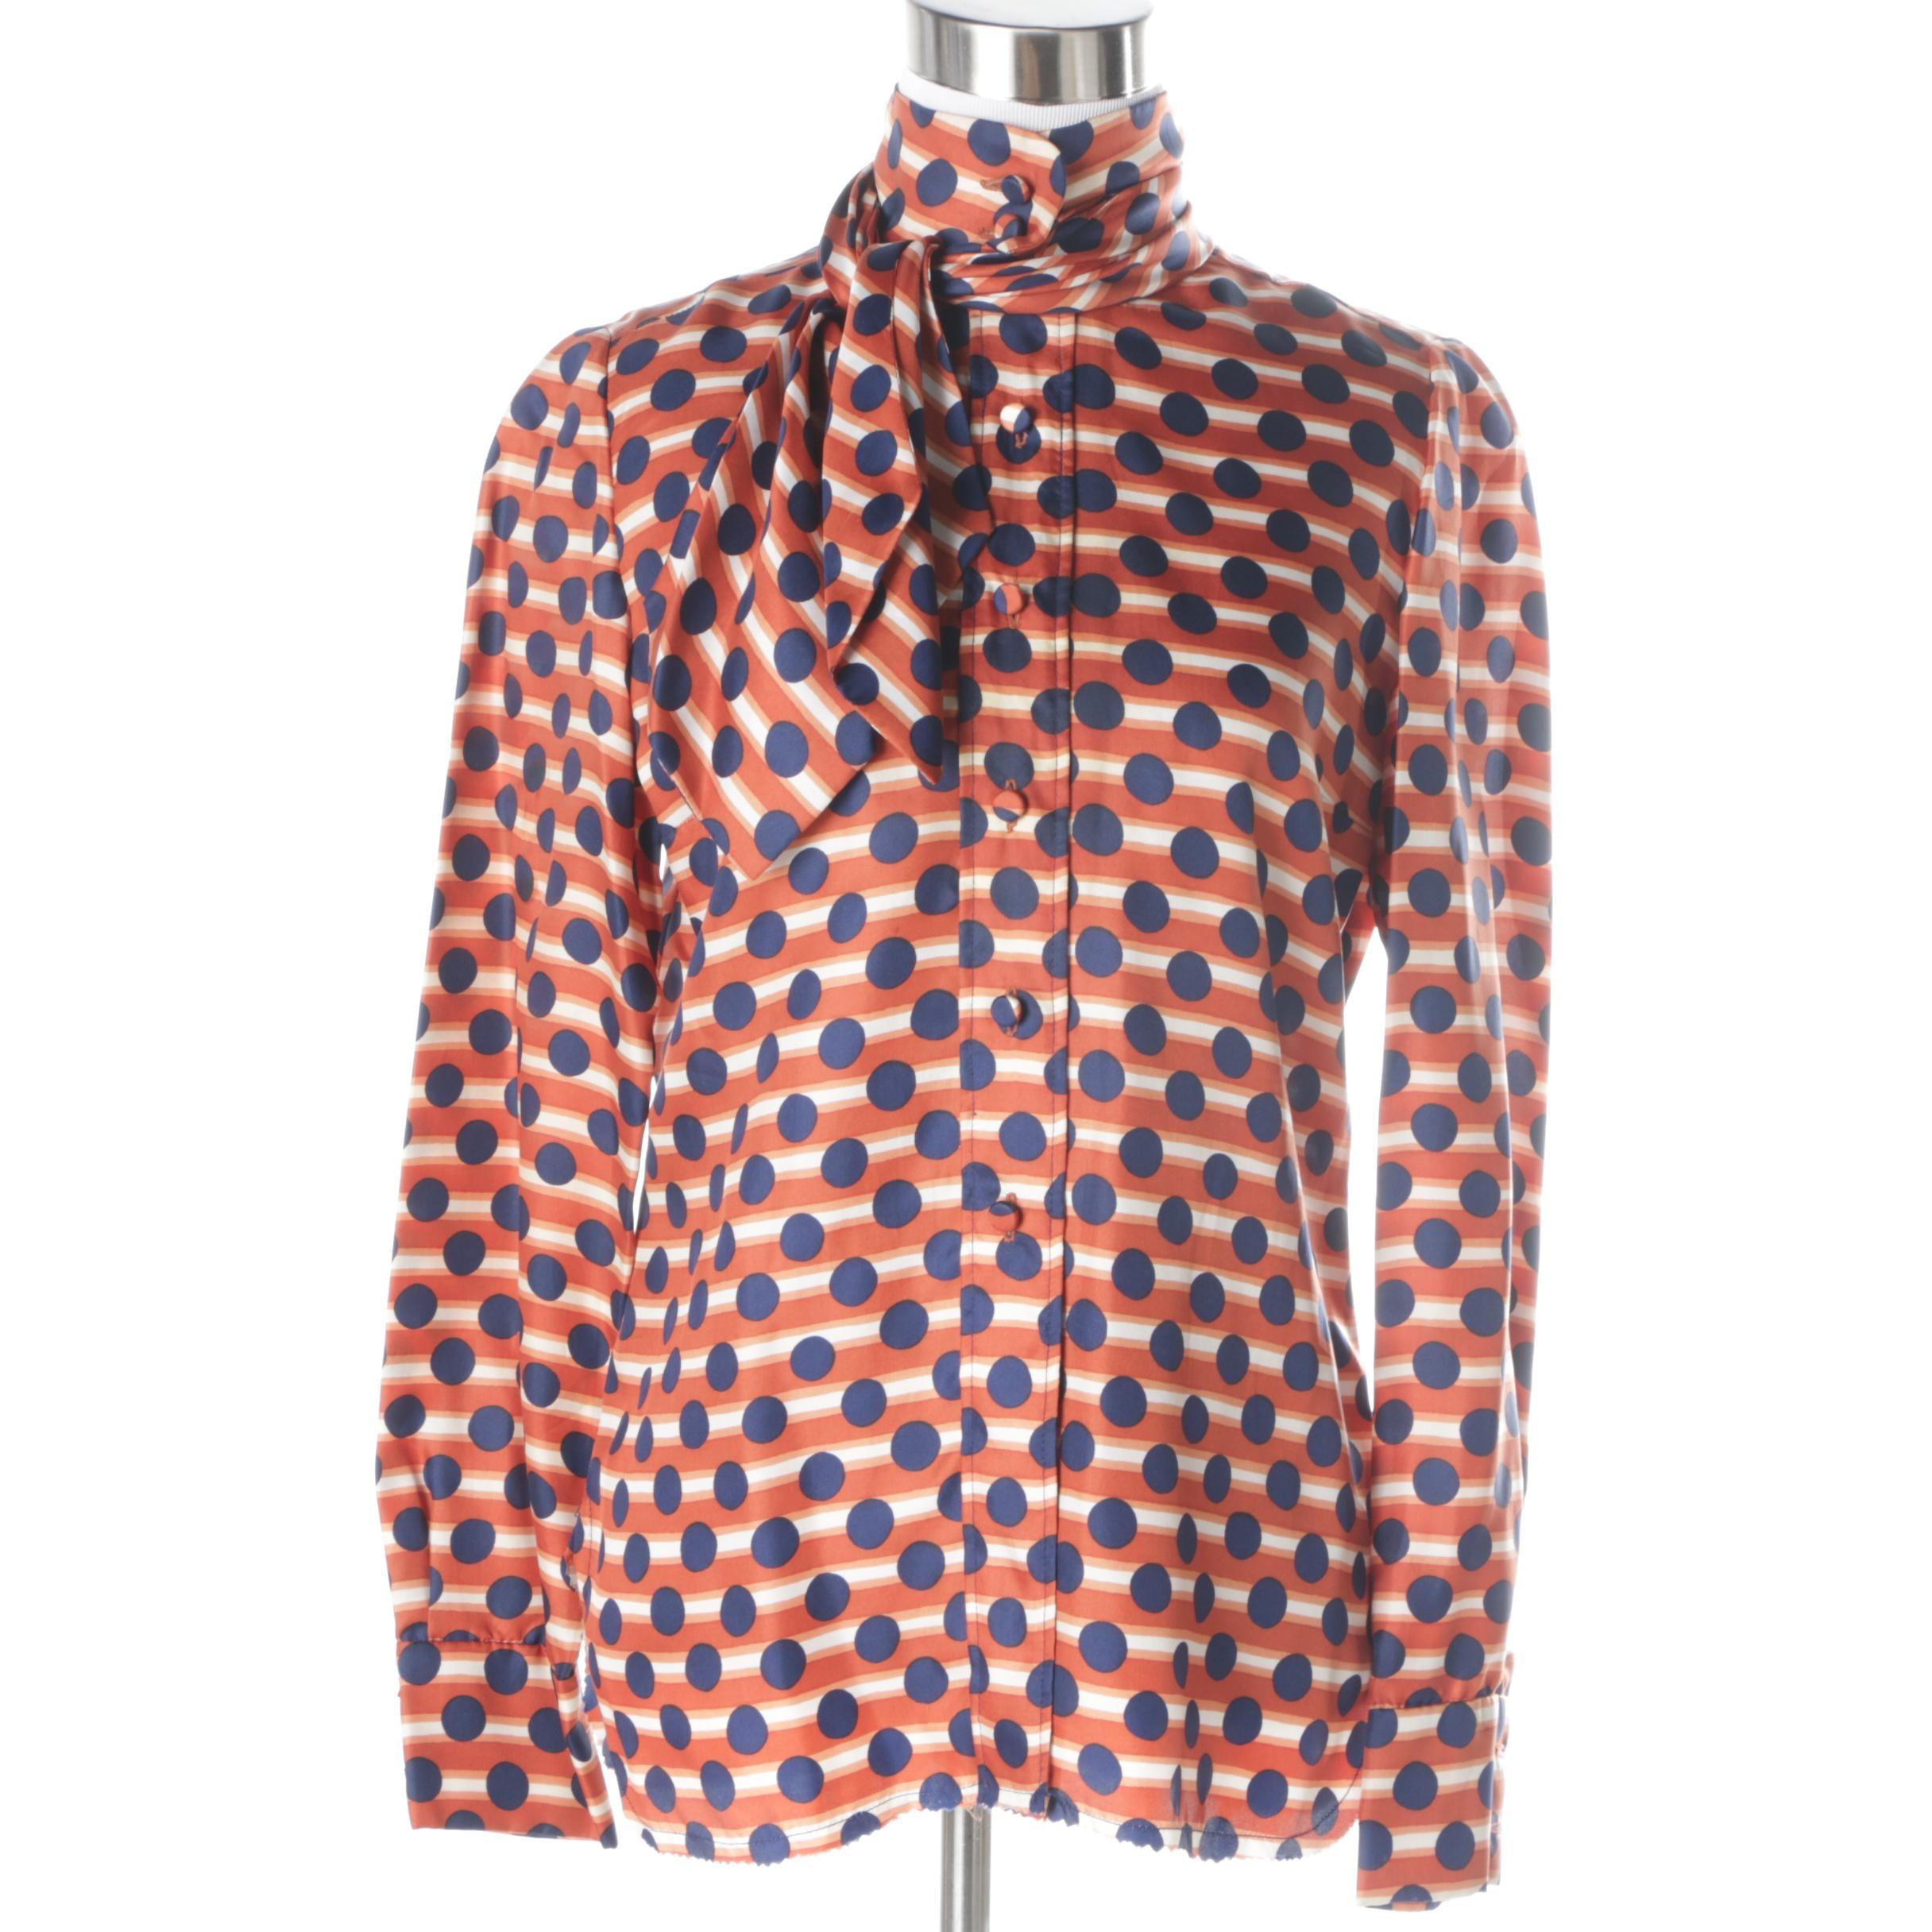 Vintage Cardinali Orange and Blue Polka-Dot Shirt